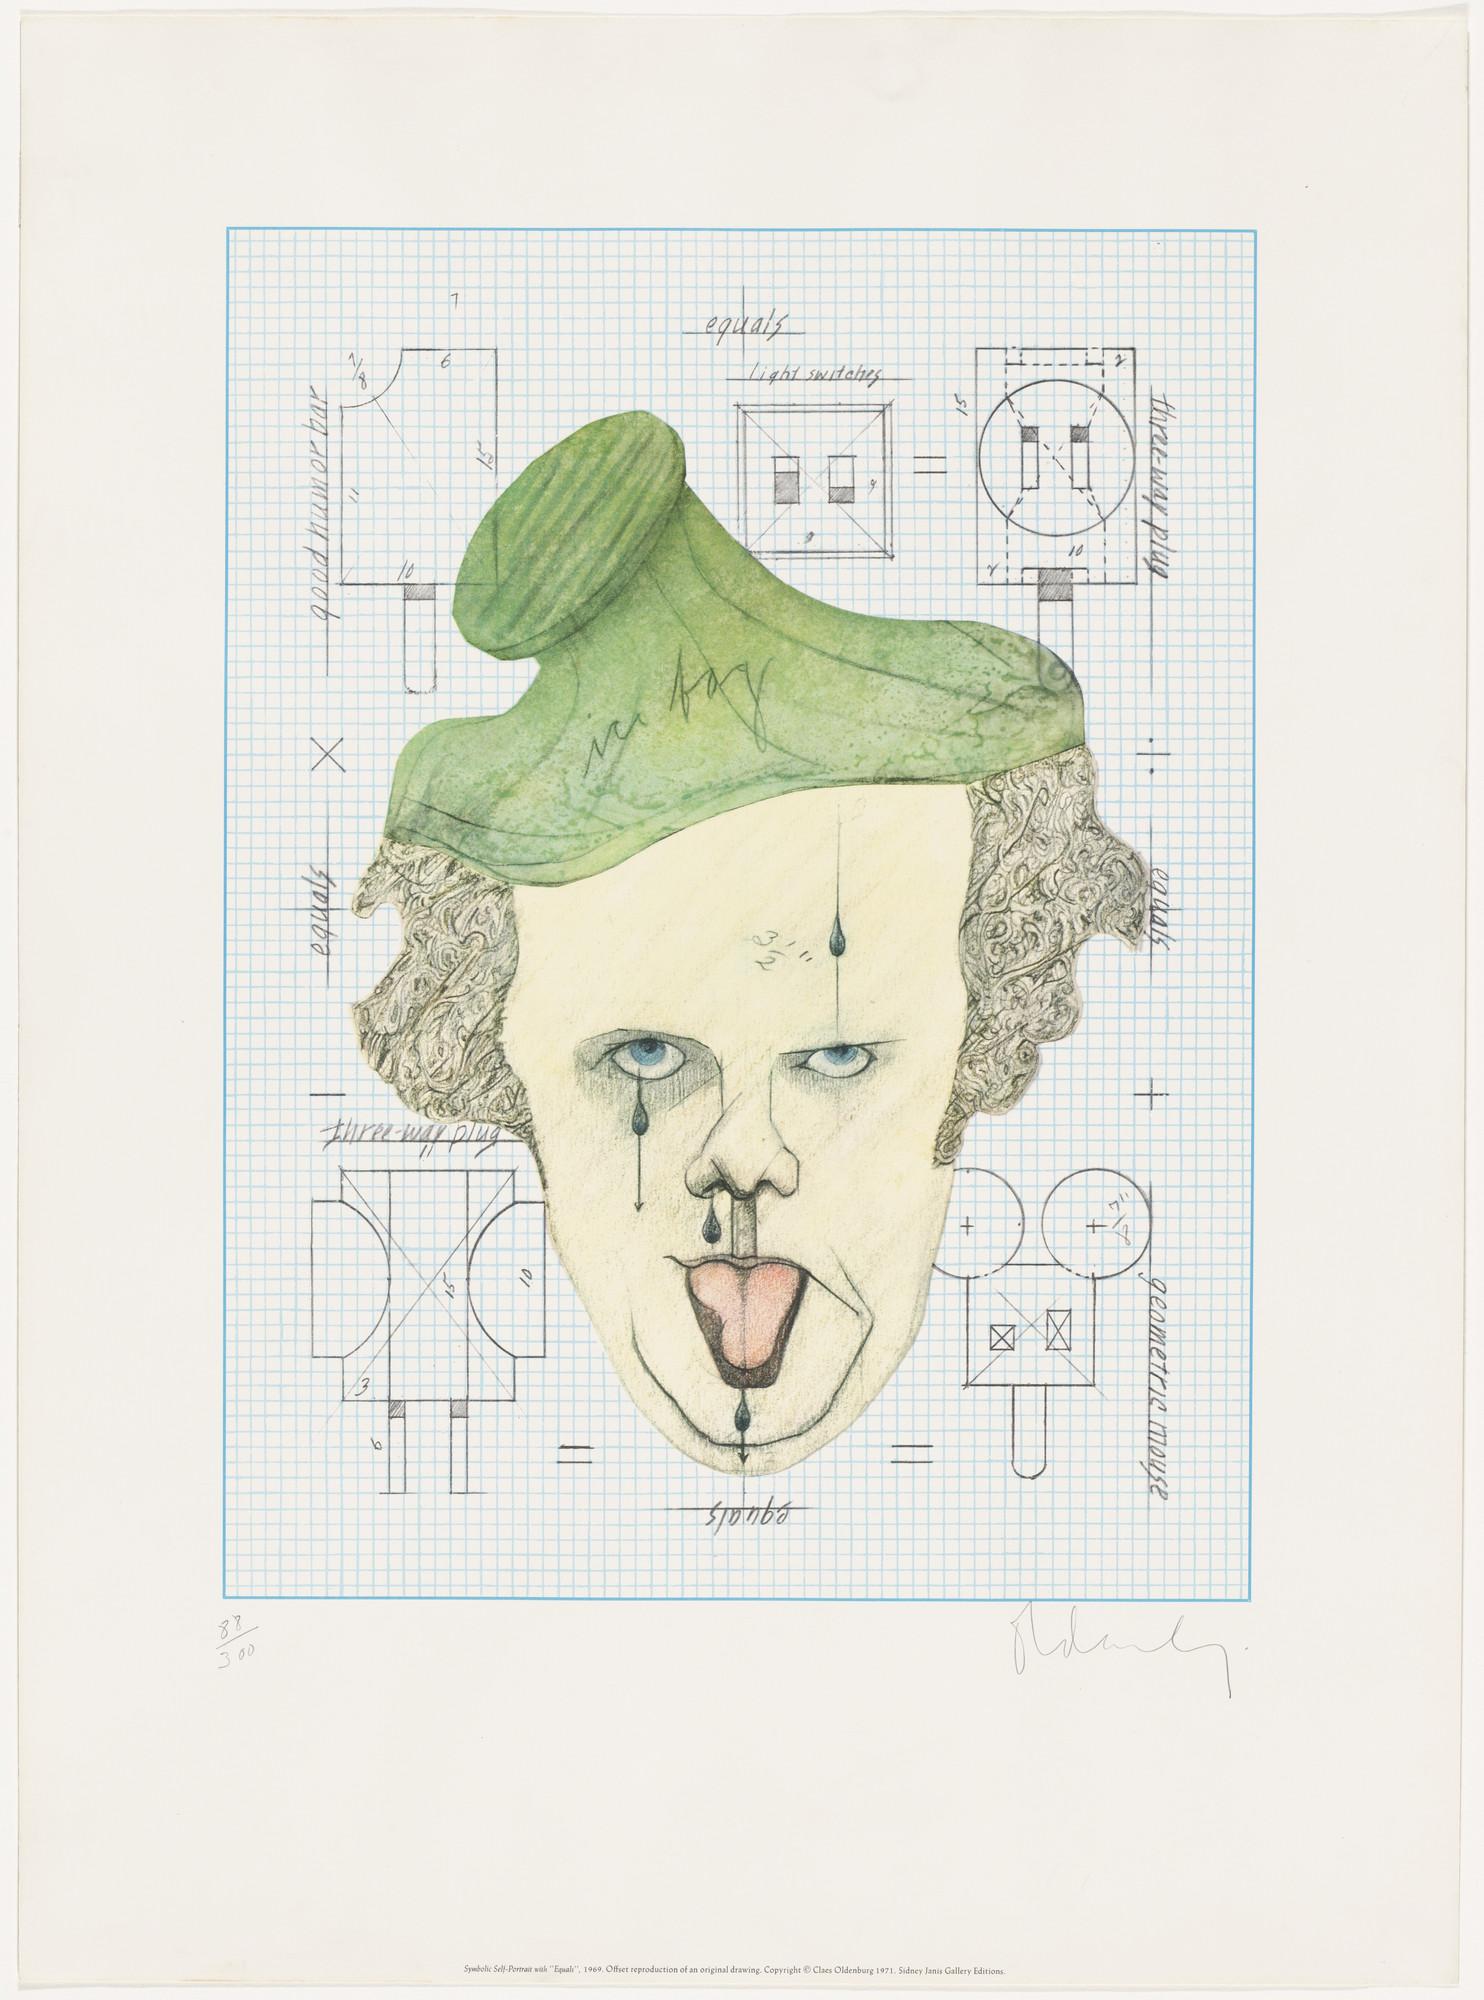 Claes Oldenburg Symbolic Self Portrait With Equals 1971 Moma